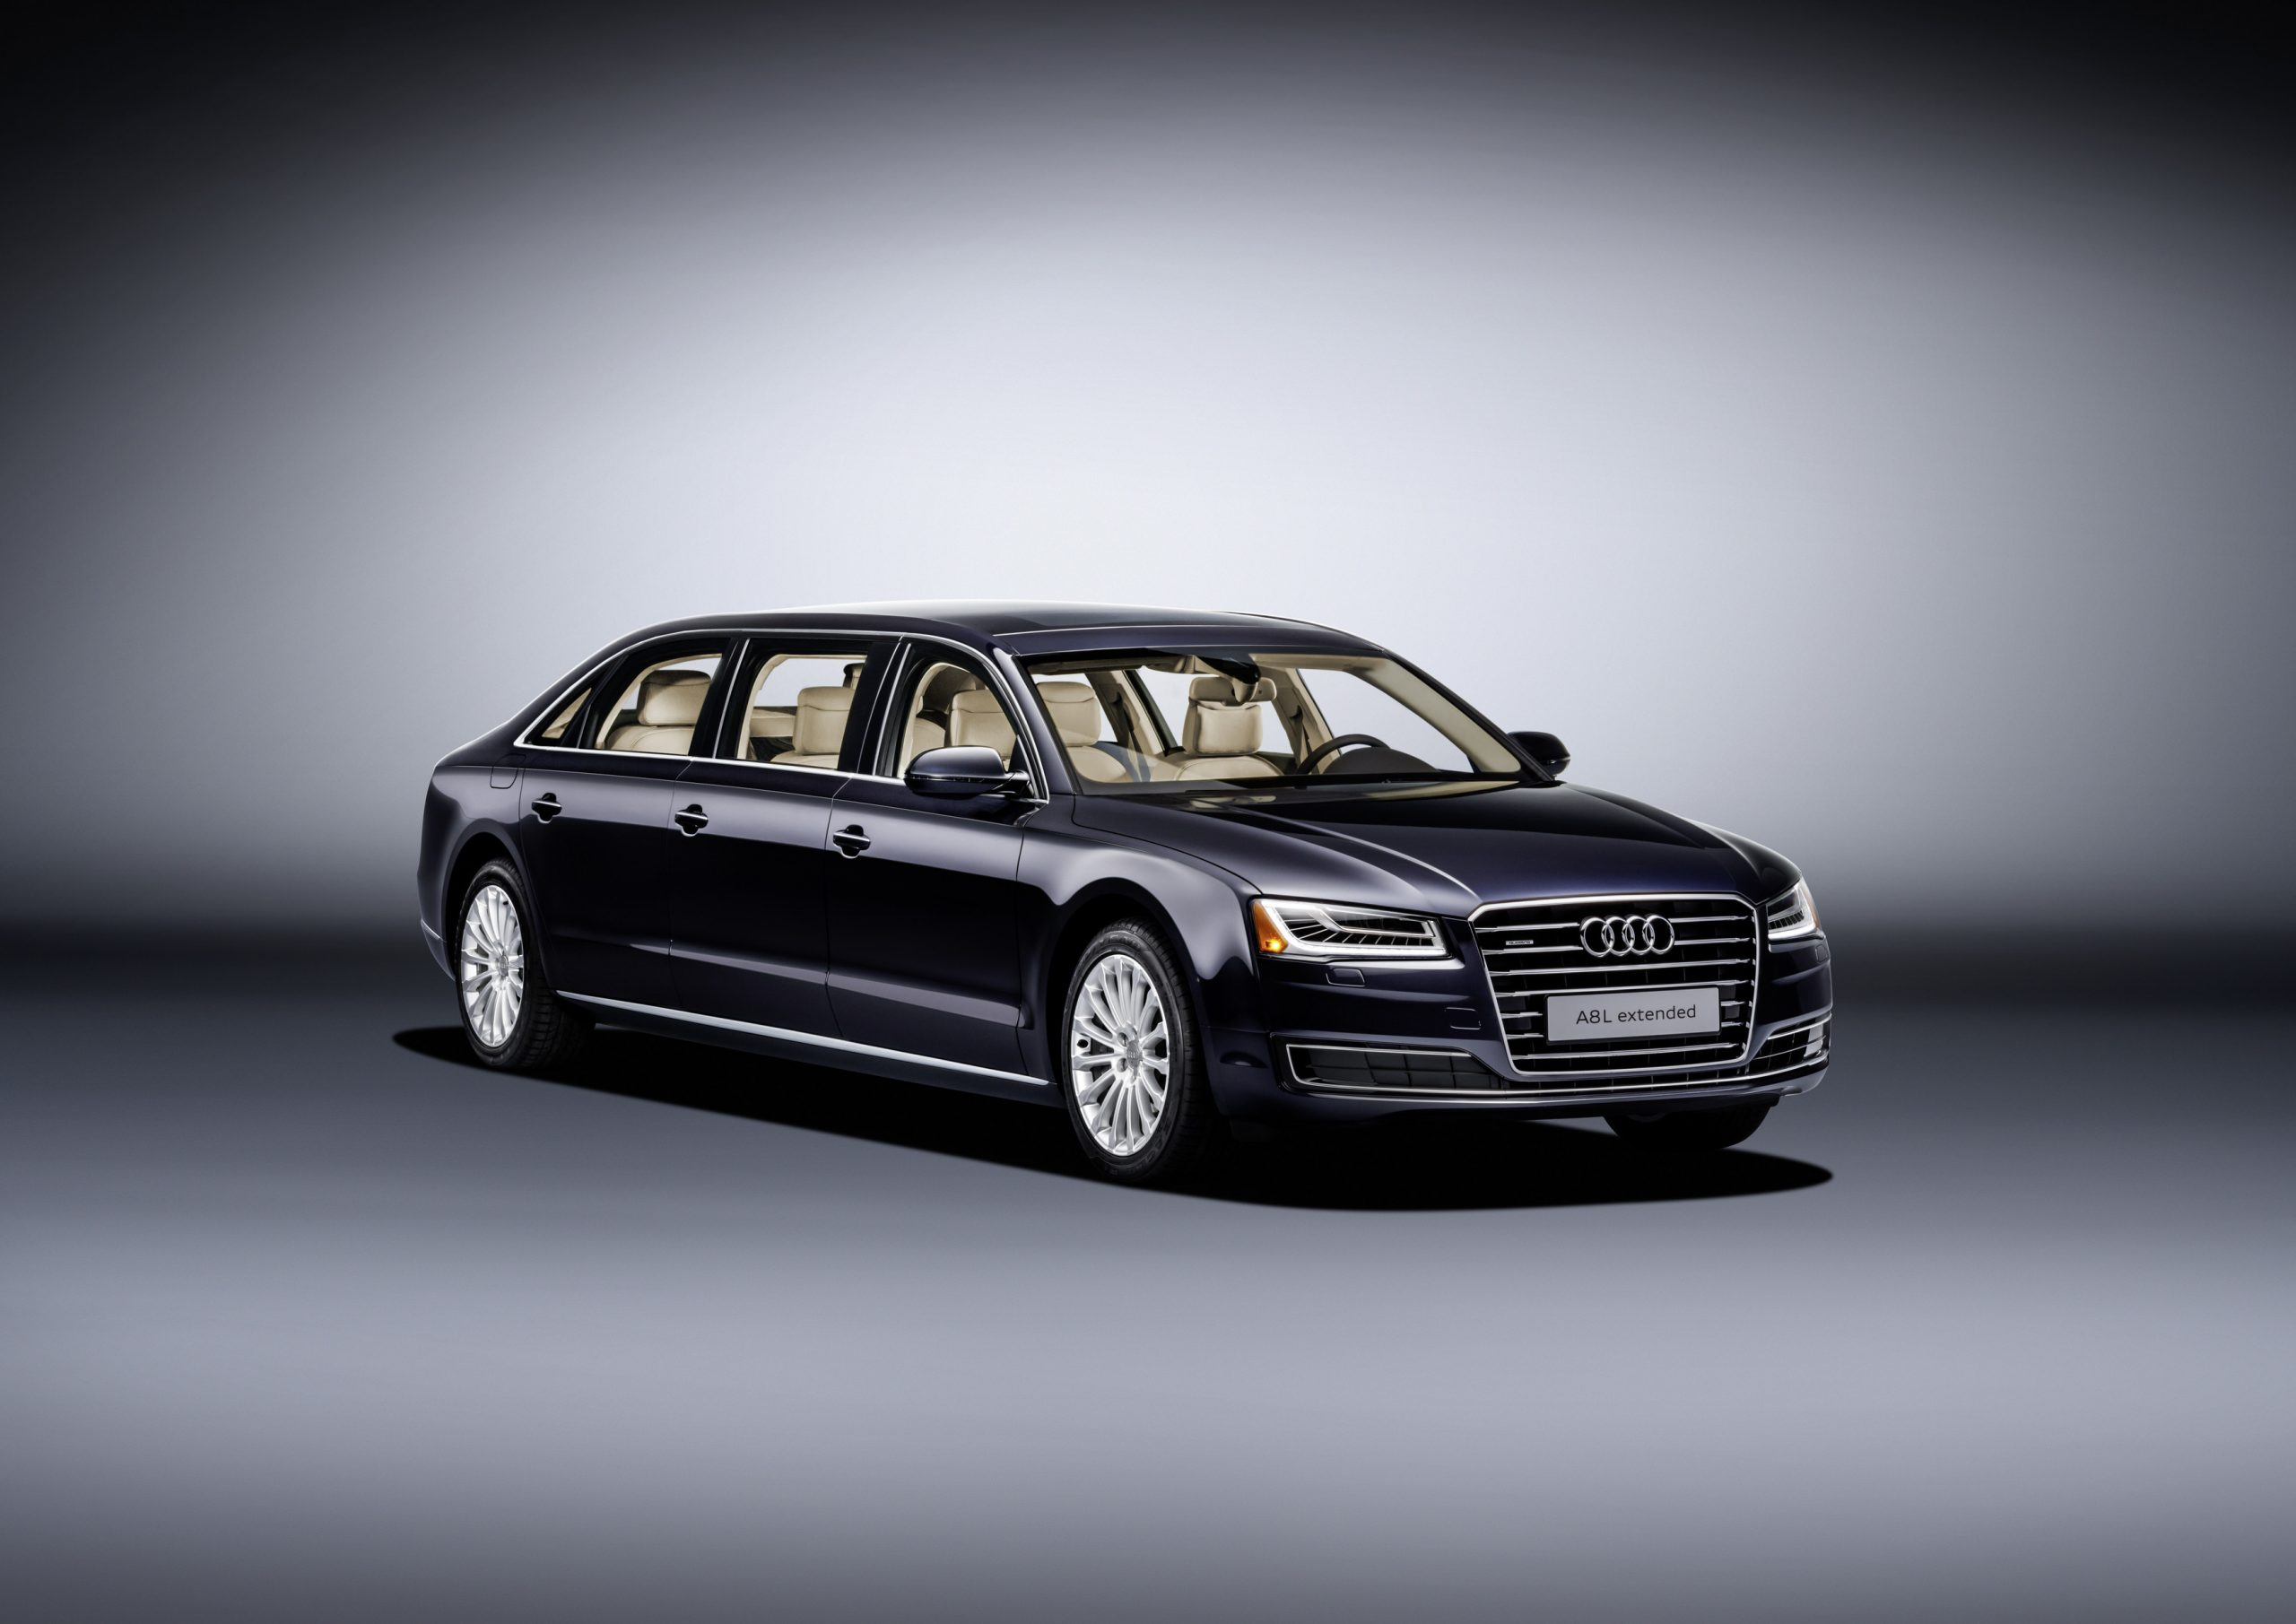 Black Audi A8 L Extended